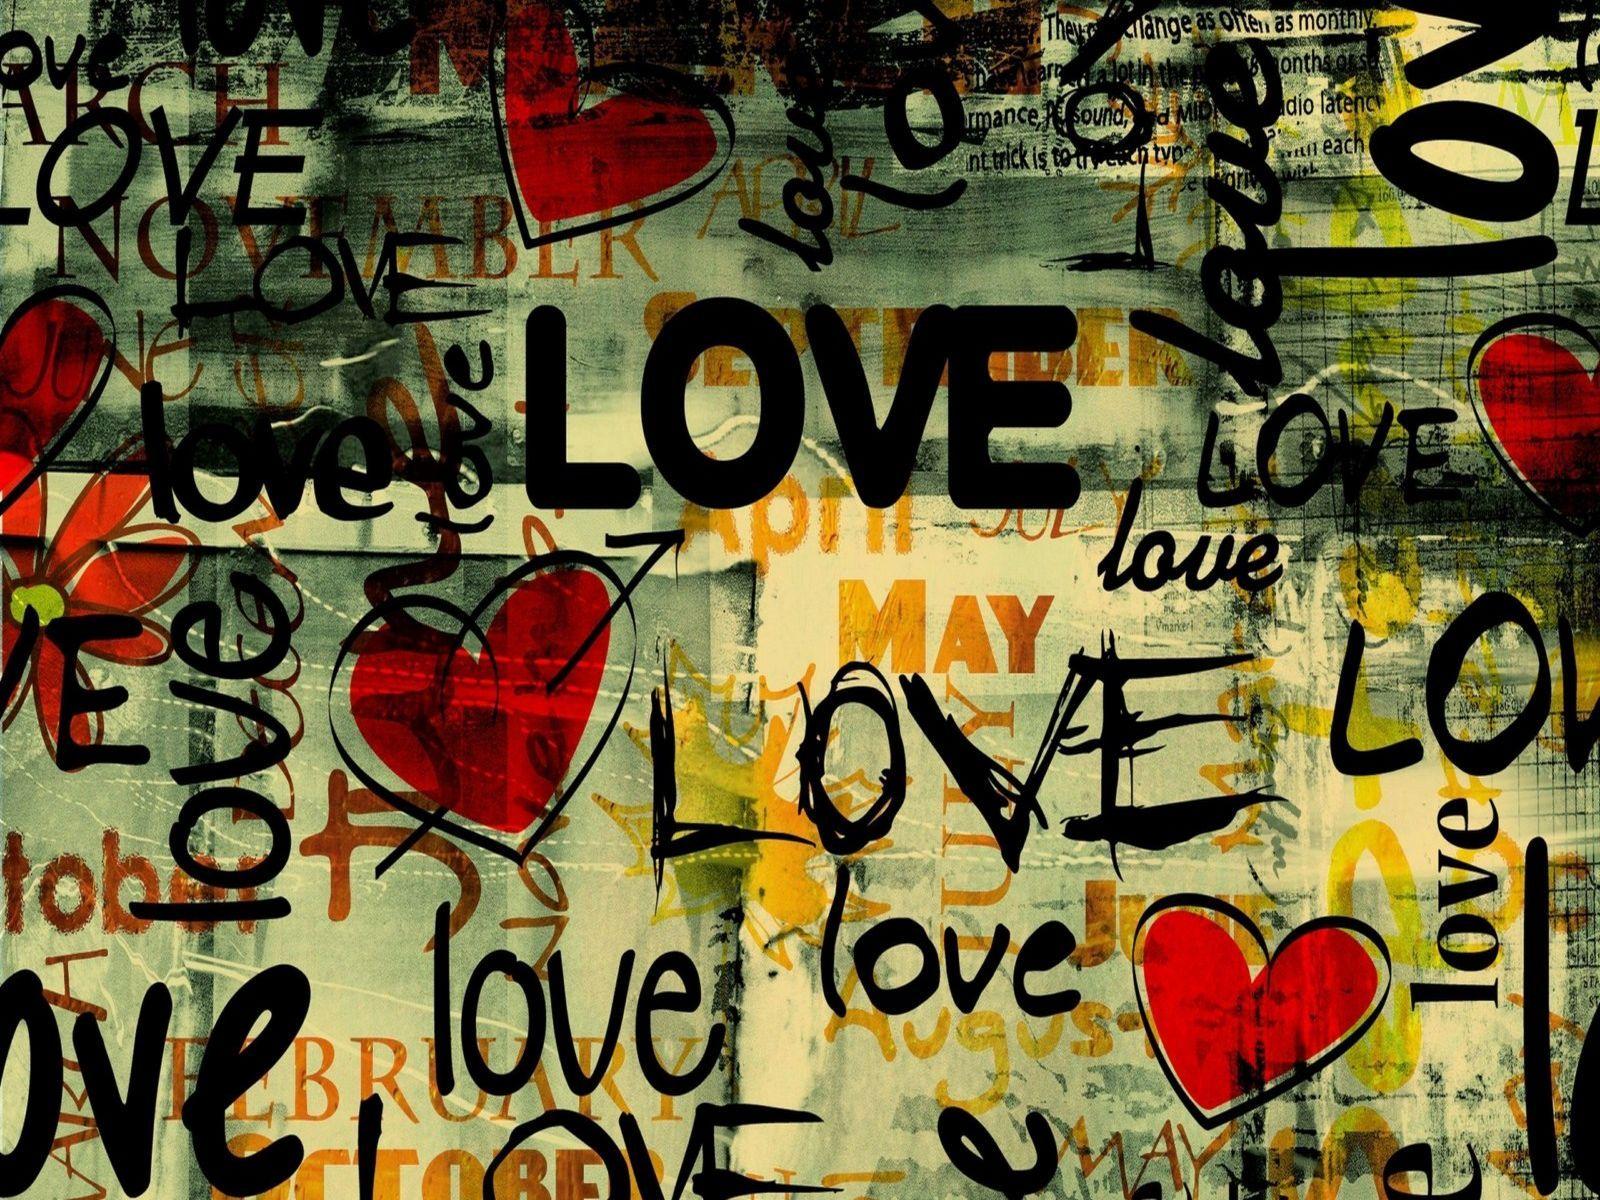 Trendy Love Art Hd Widescreen Desktop Wallpaper Love Graffiti Typography Wallpaper Love Background Images